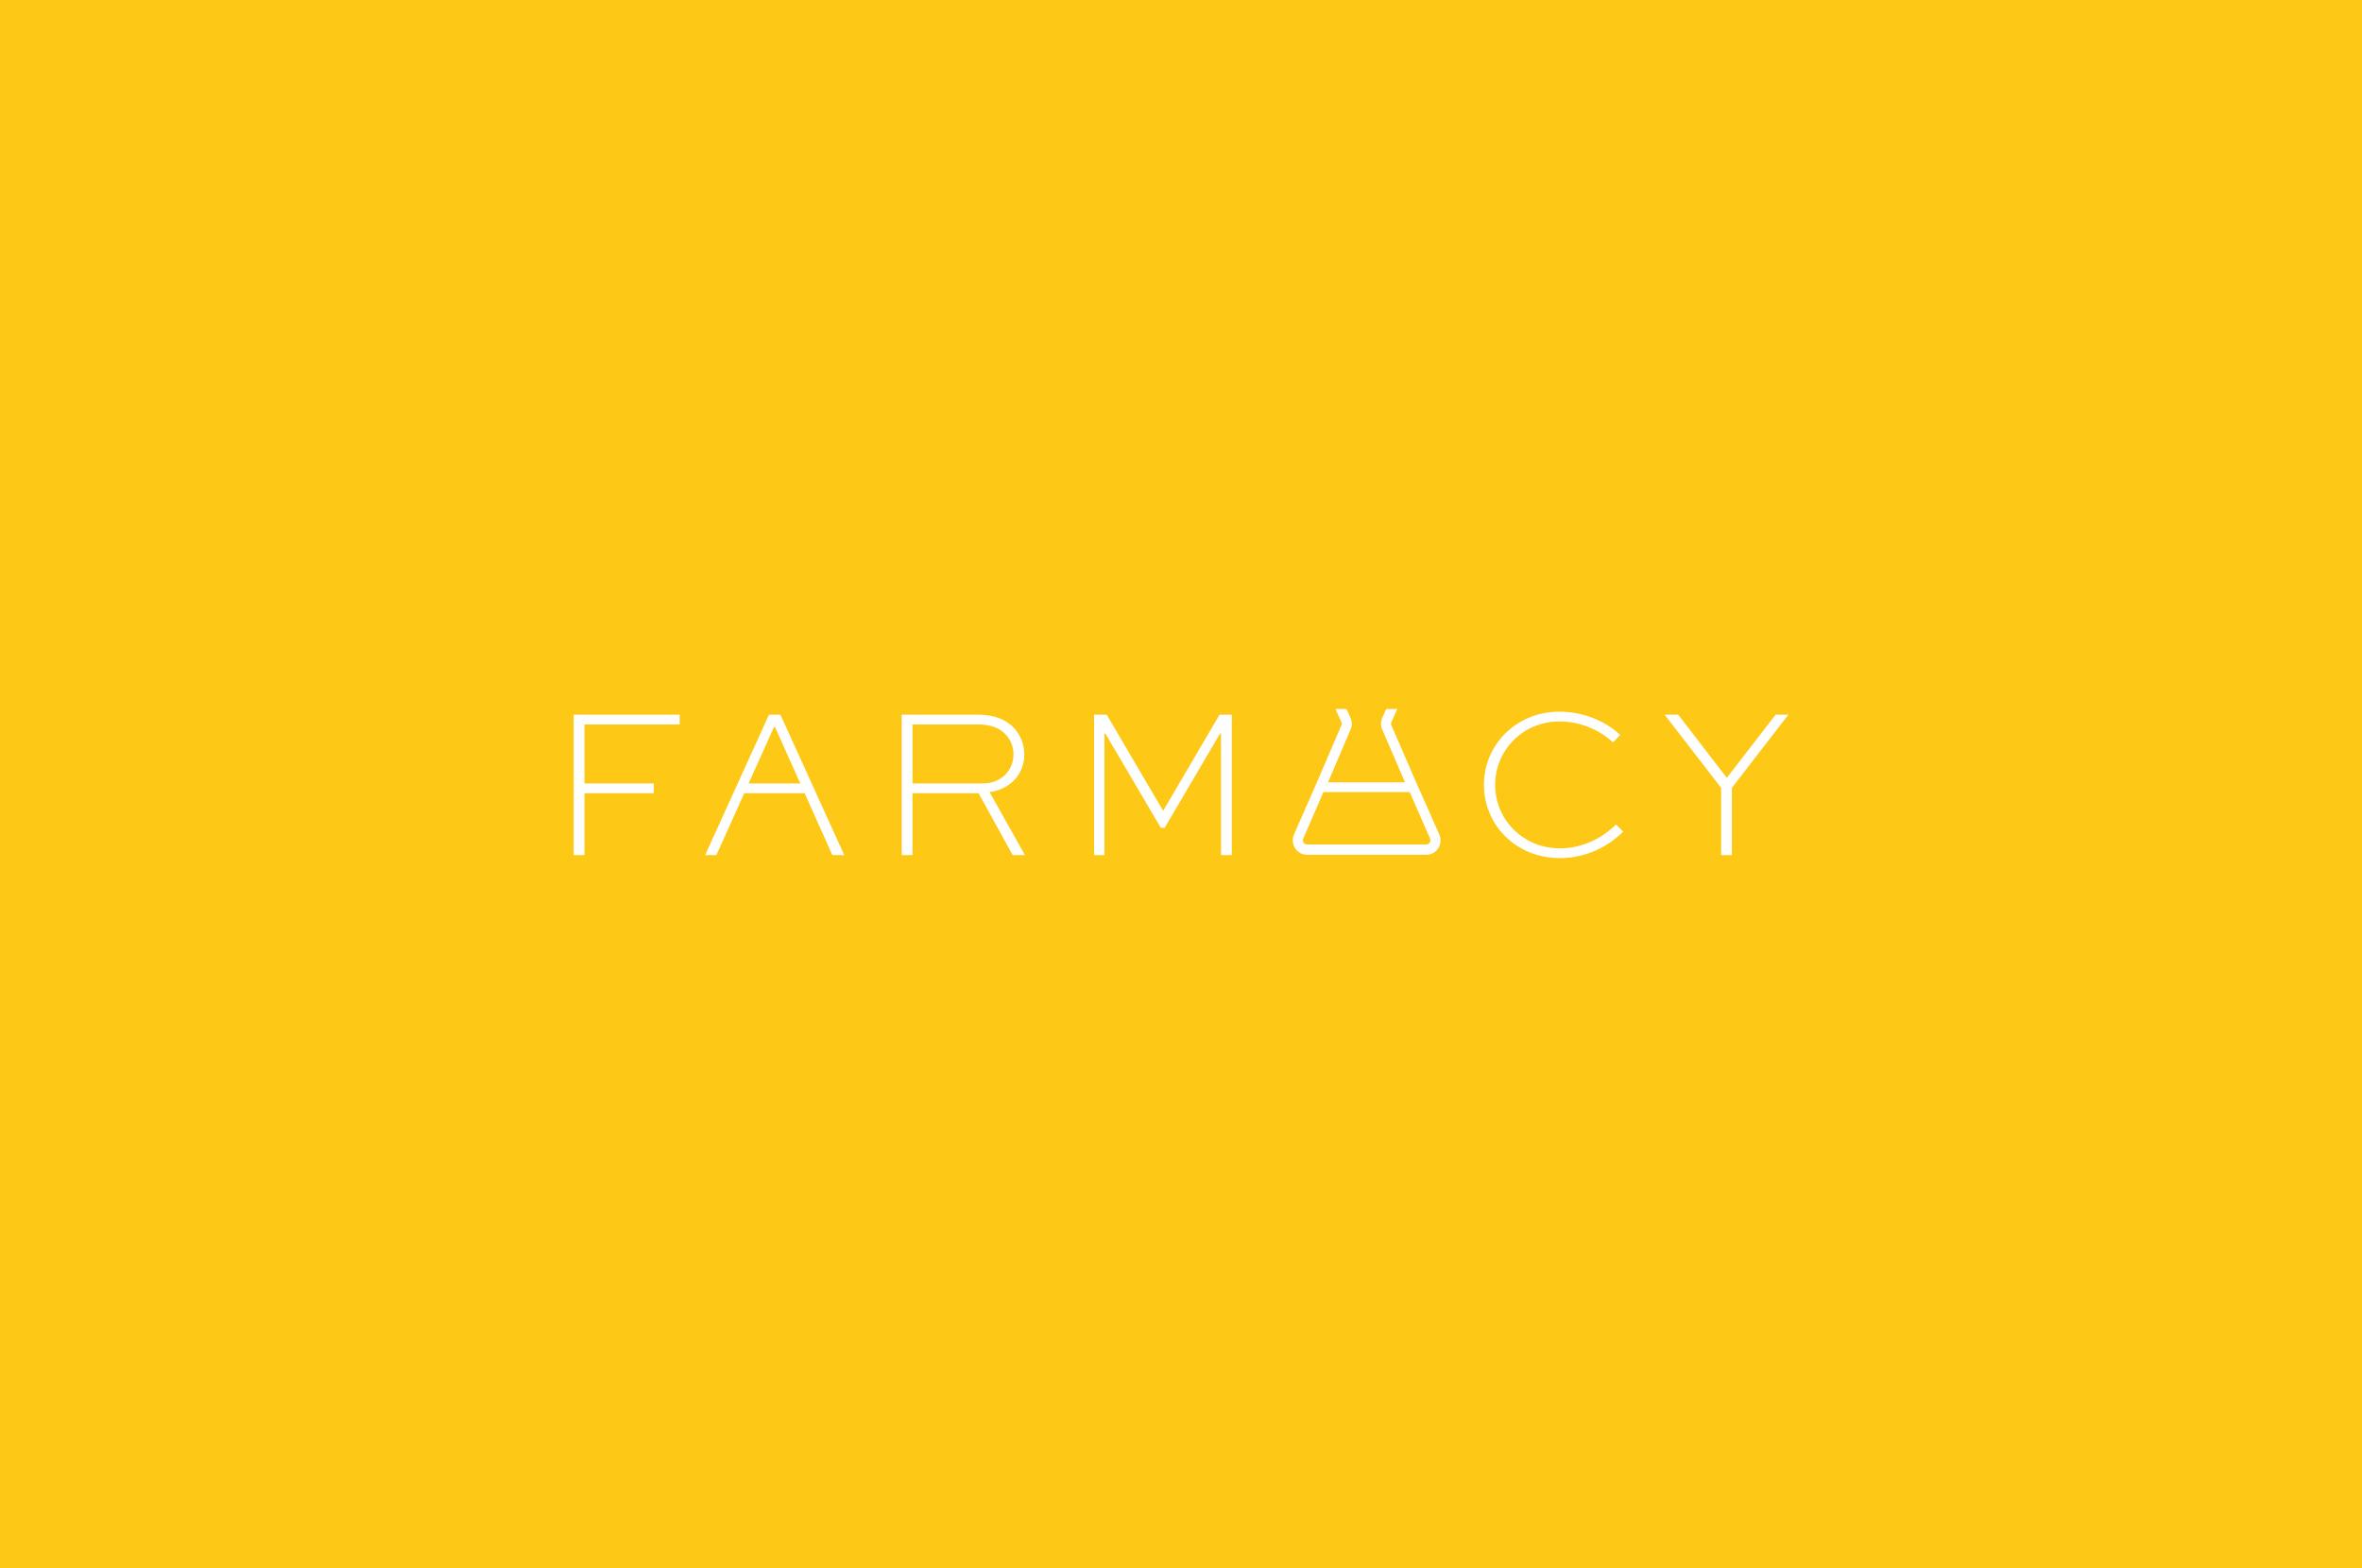 Dothings_Farmacy_02.jpg